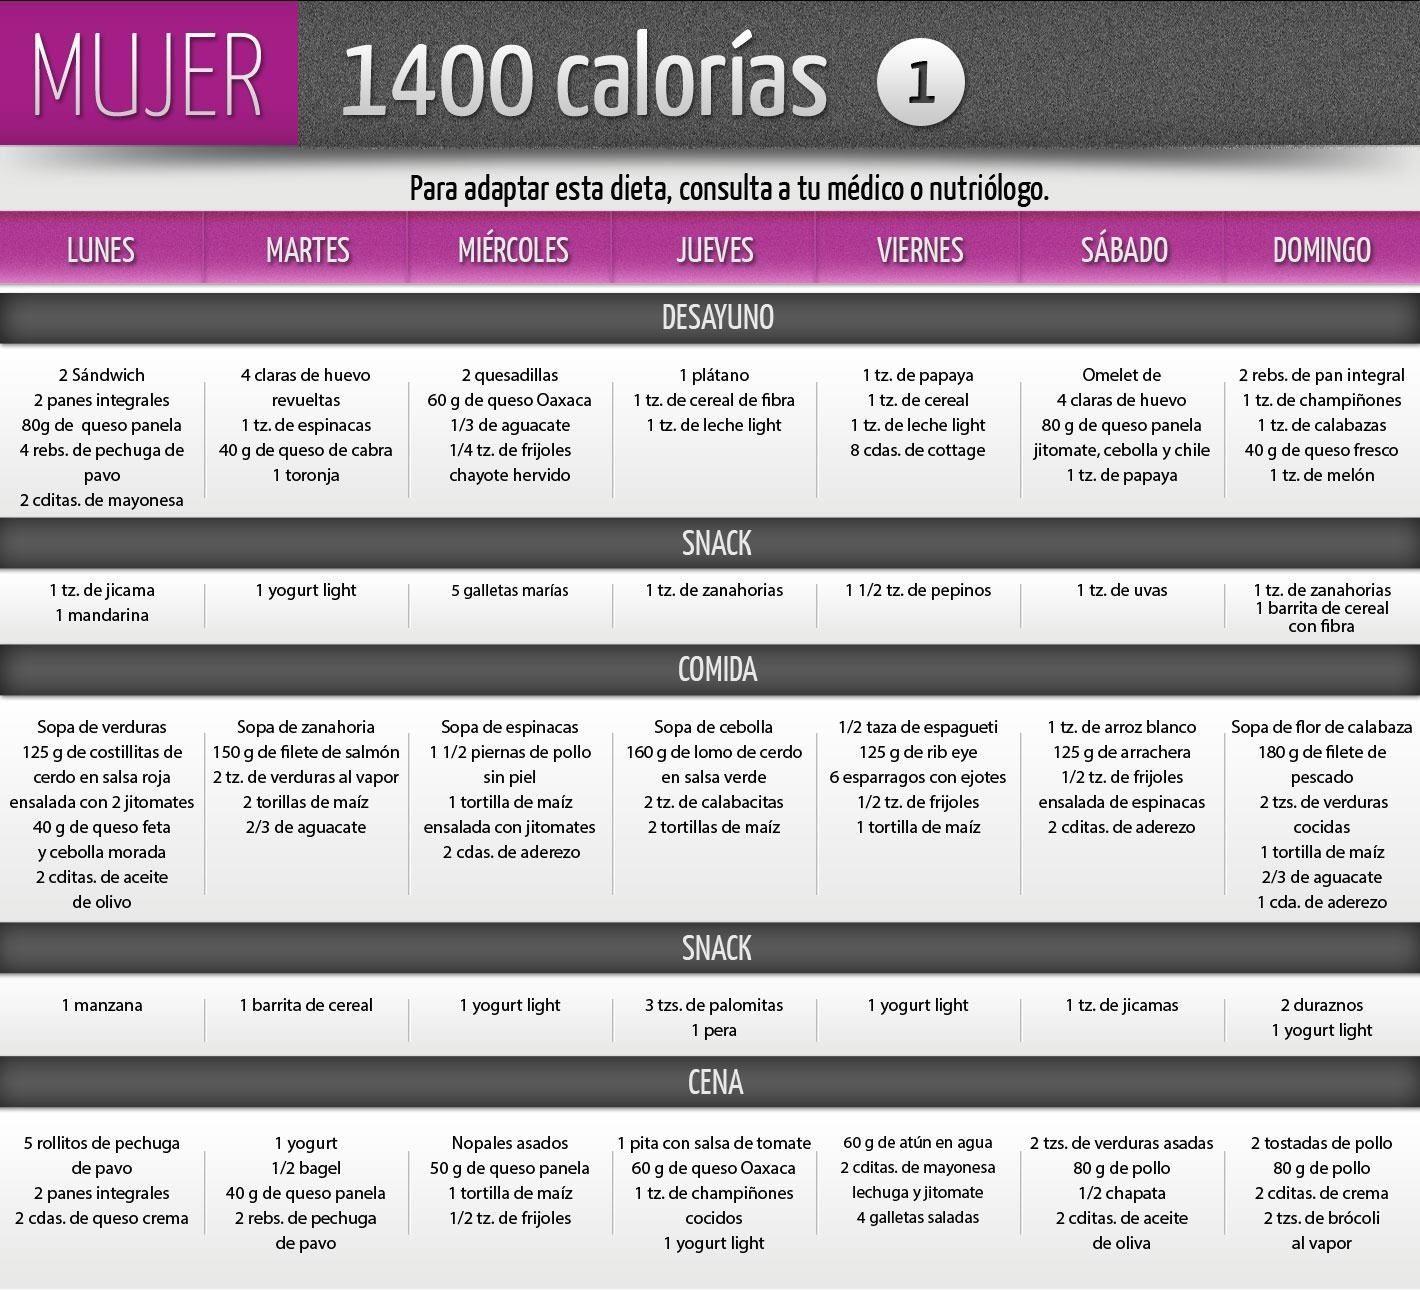 Variada Caloras Dieta Mujer Para Rica Una De Yuna Dieta De 1400 Calorías Para Mujer Variada Y Rica Diet 1500 Calorie Diet Workout Food